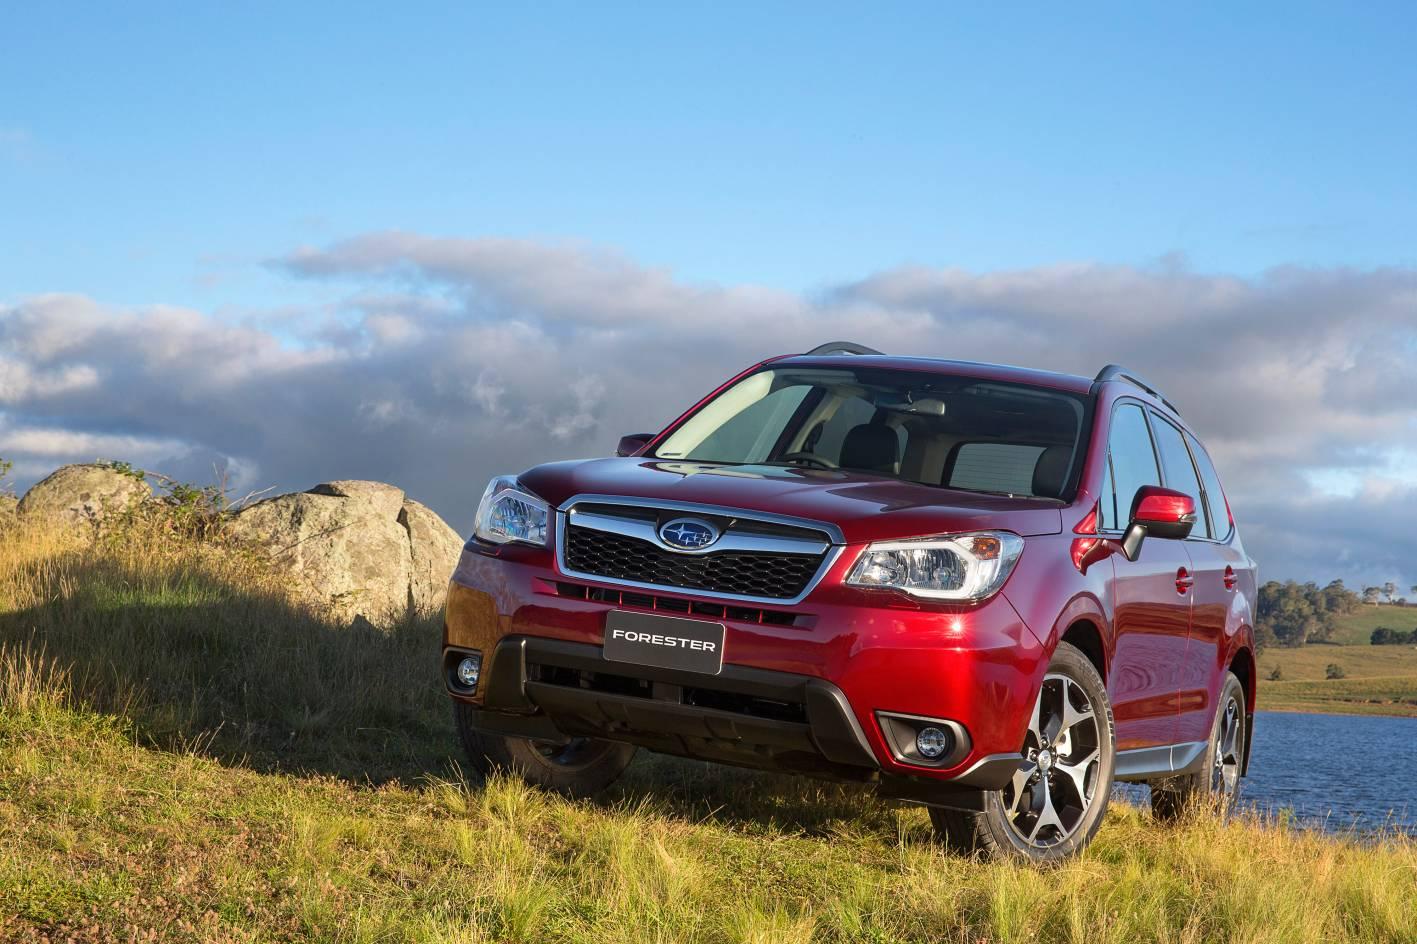 2016 Subaru Forester.jpg